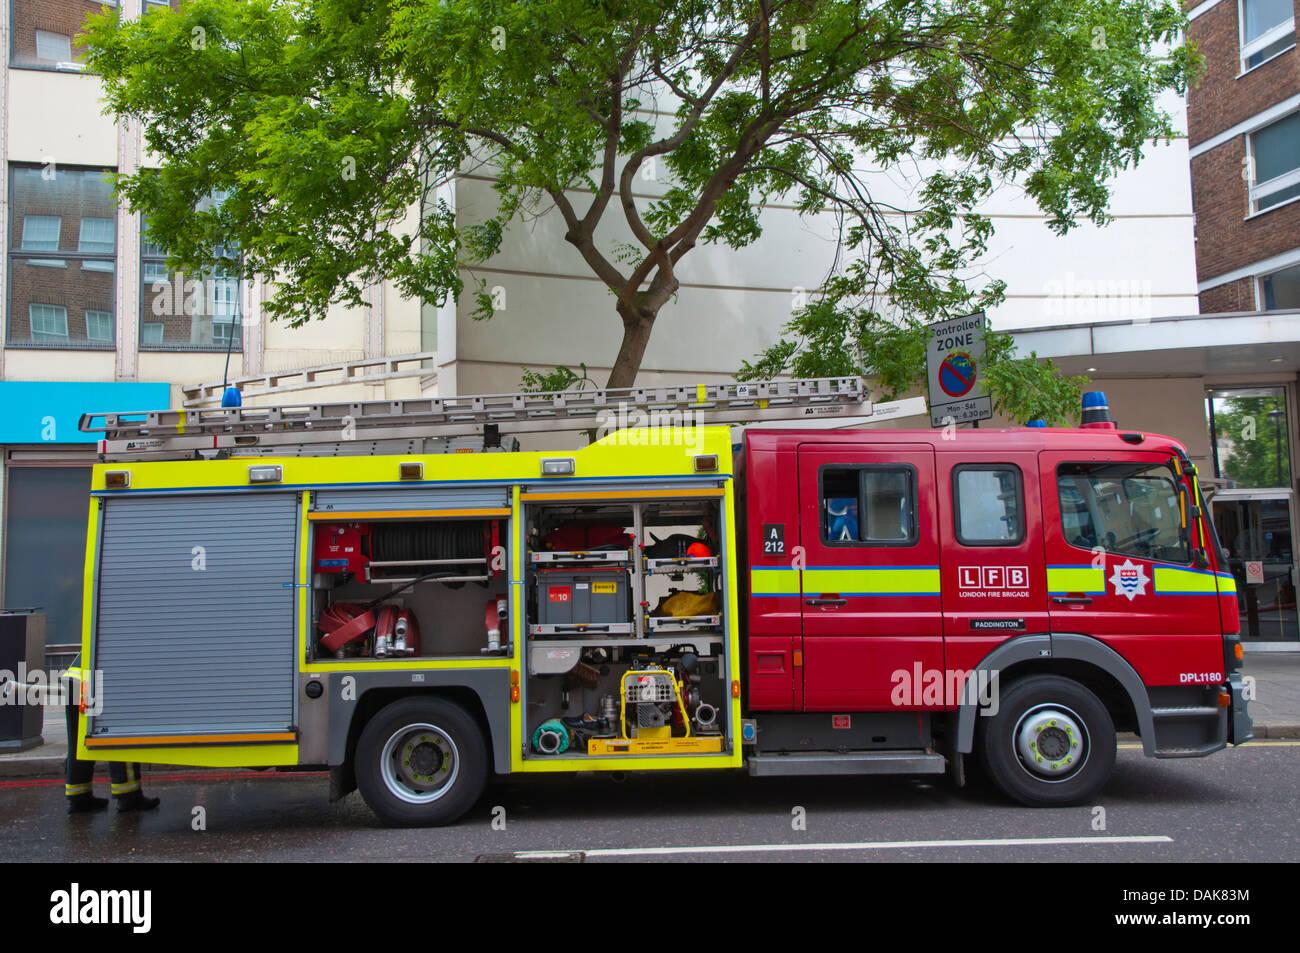 Fire brigade at work Marylebone district London England Britain UK Europe - Stock Image